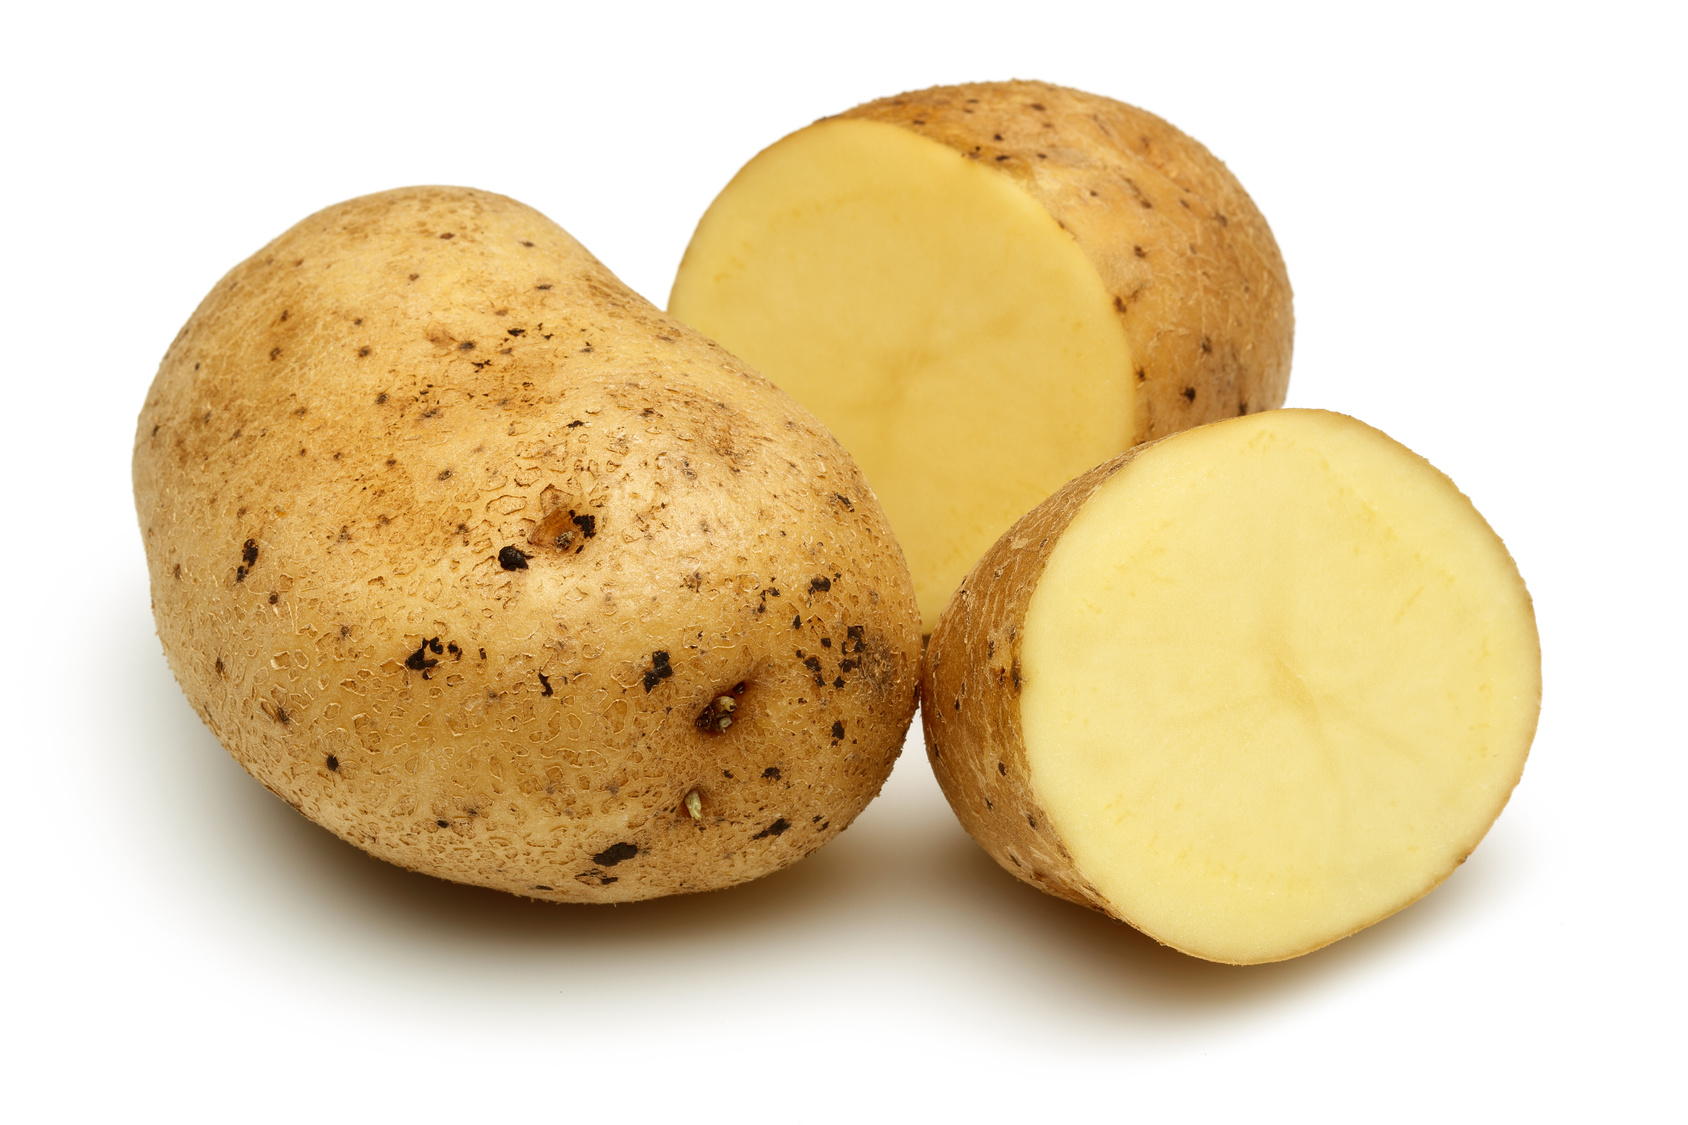 6. Non-organic potatoes